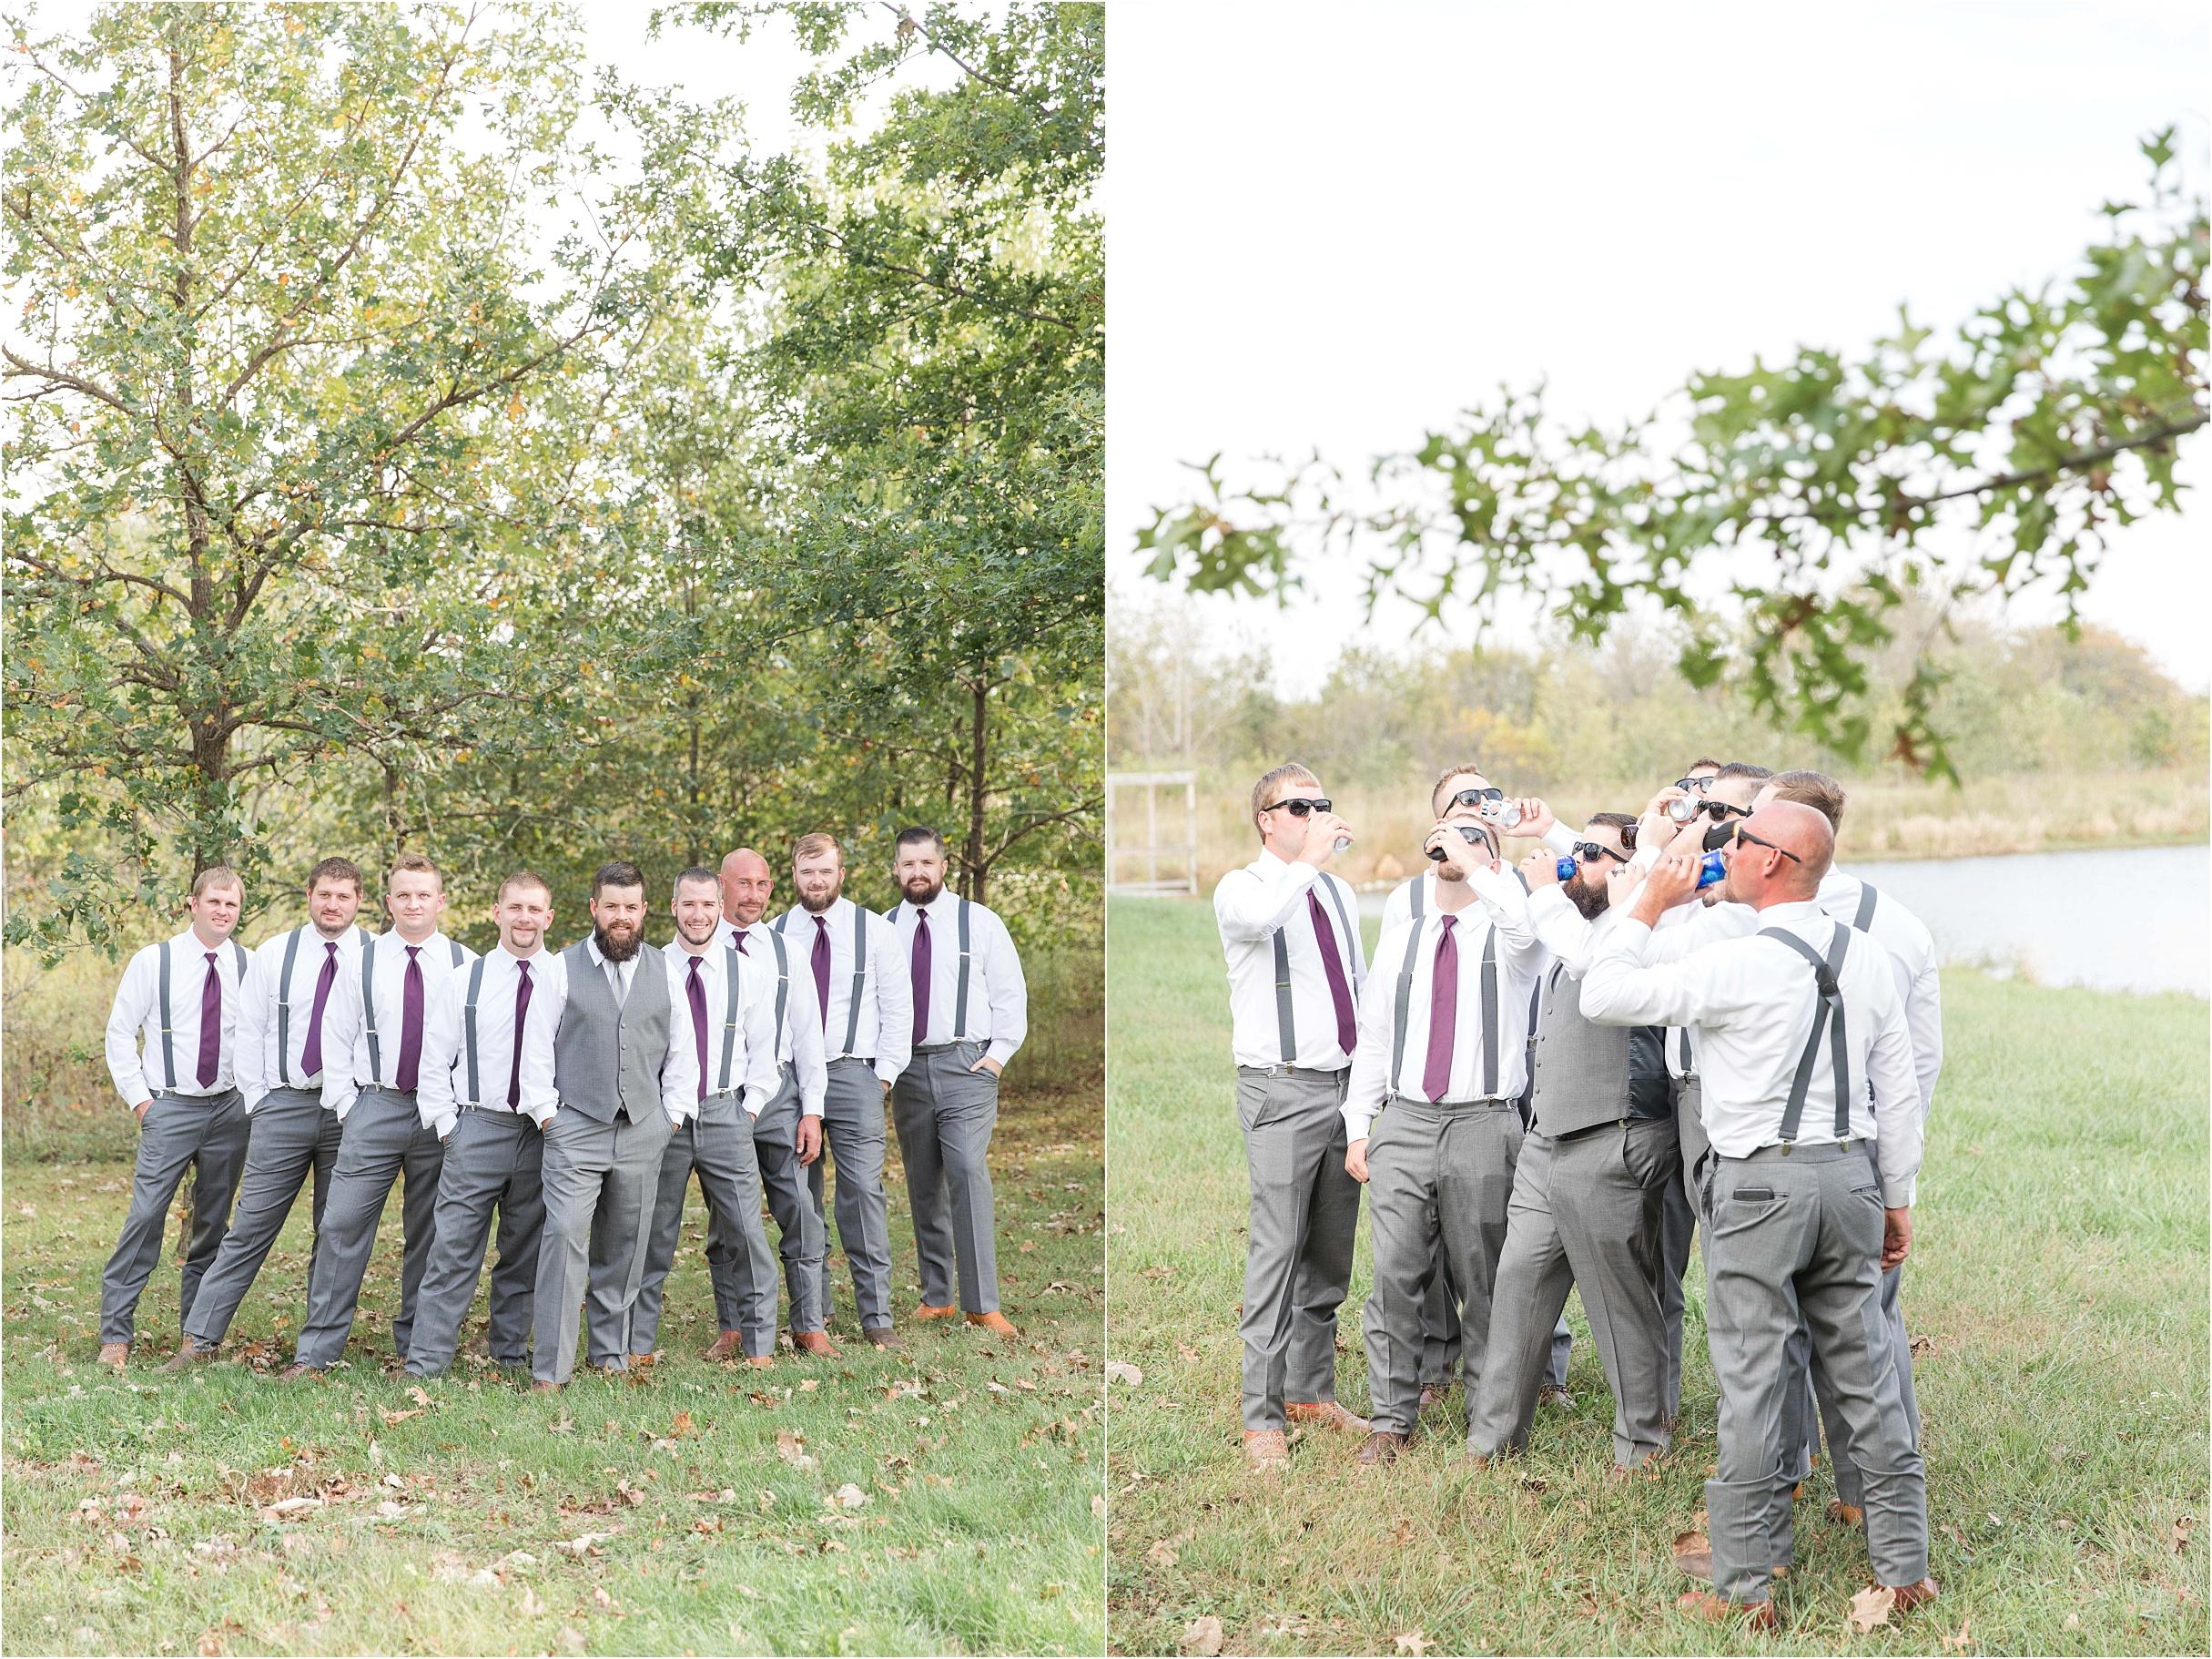 Swiney's Wedding at Arpeggio Winery in Pana, Il | Hidden ...